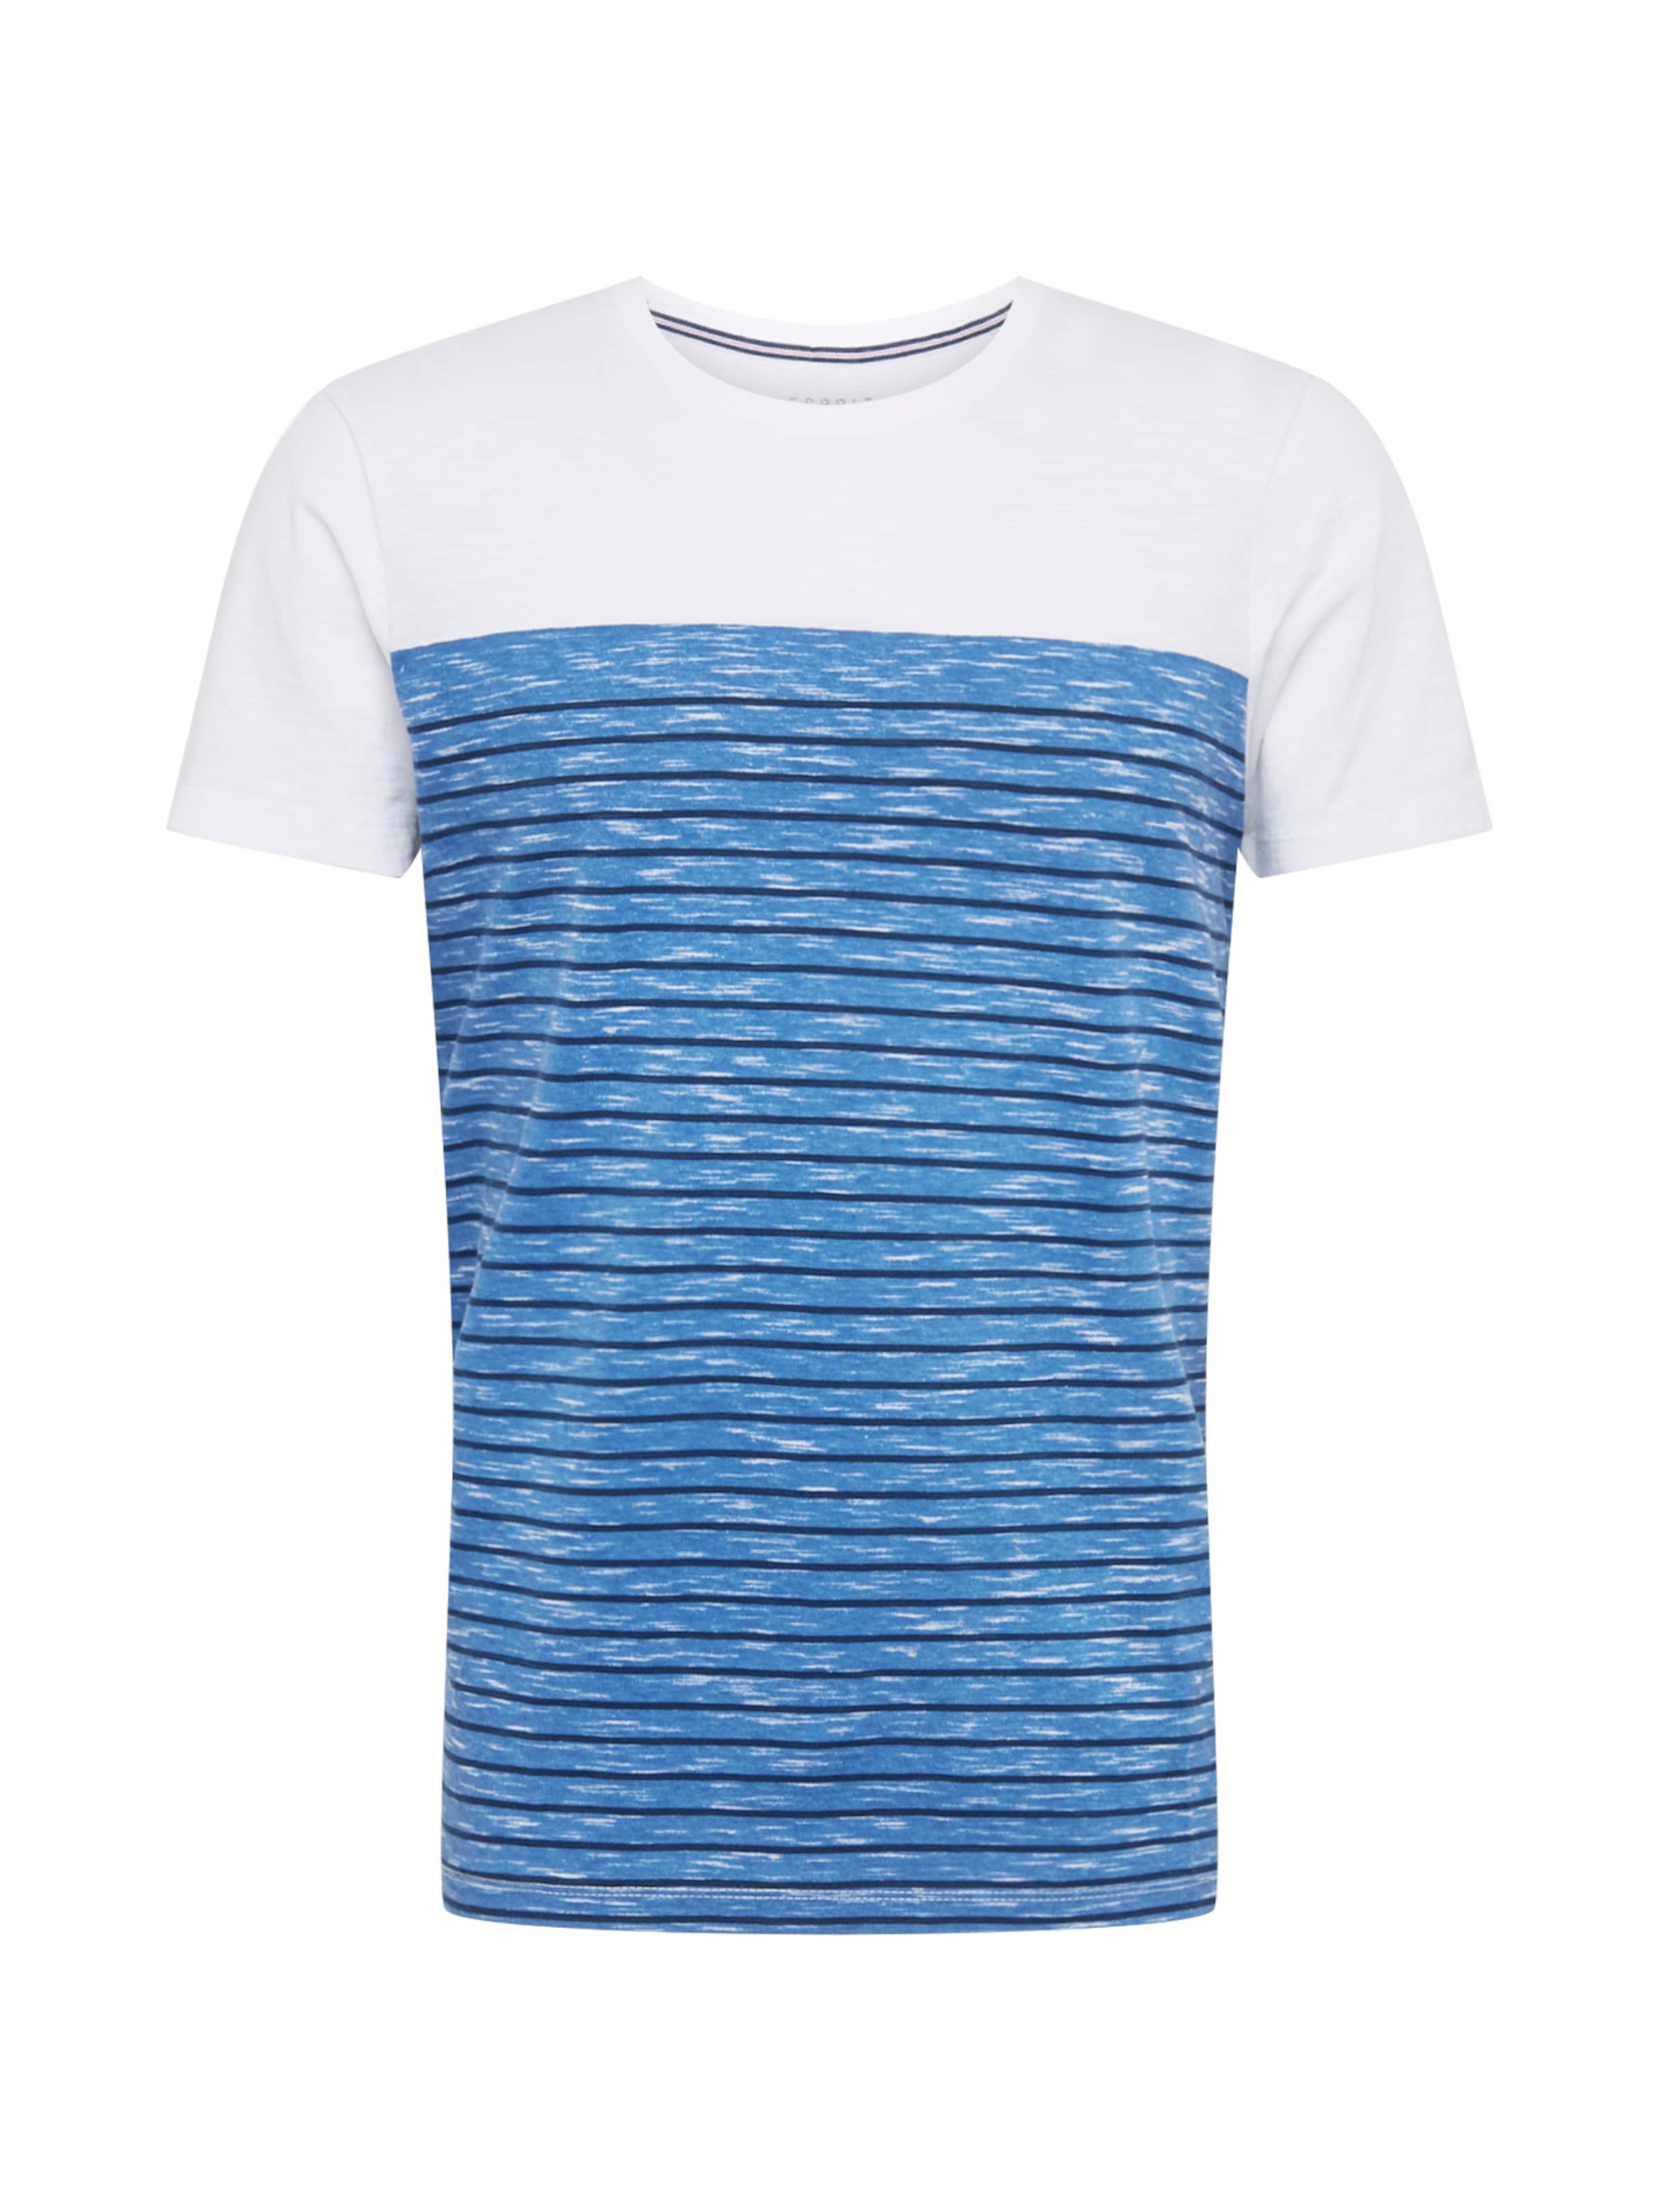 Shirt Esprit Esprit NavyWeiß NavyWeiß Esprit In In In Shirt NavyWeiß Shirt LUpMzqVGjS